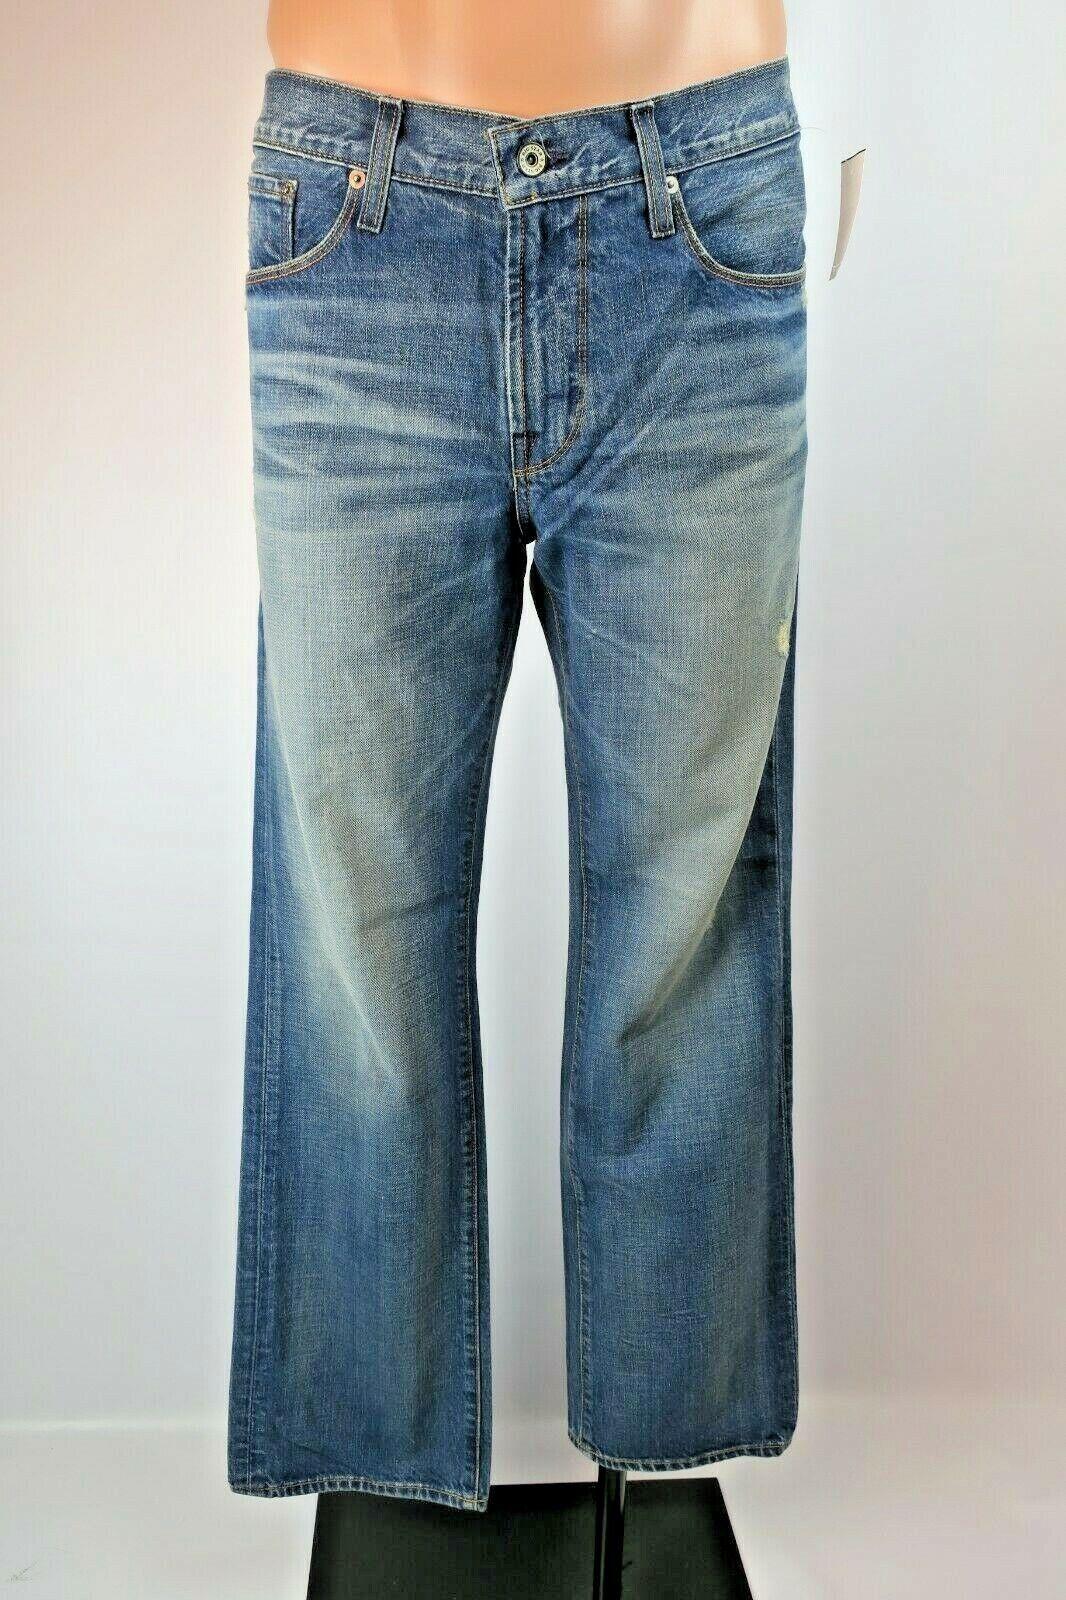 c1e5ccd4 BIG STAR Union Straight Jeans Mens SAMPLES 34x31 Distressed Denim Wash NWT